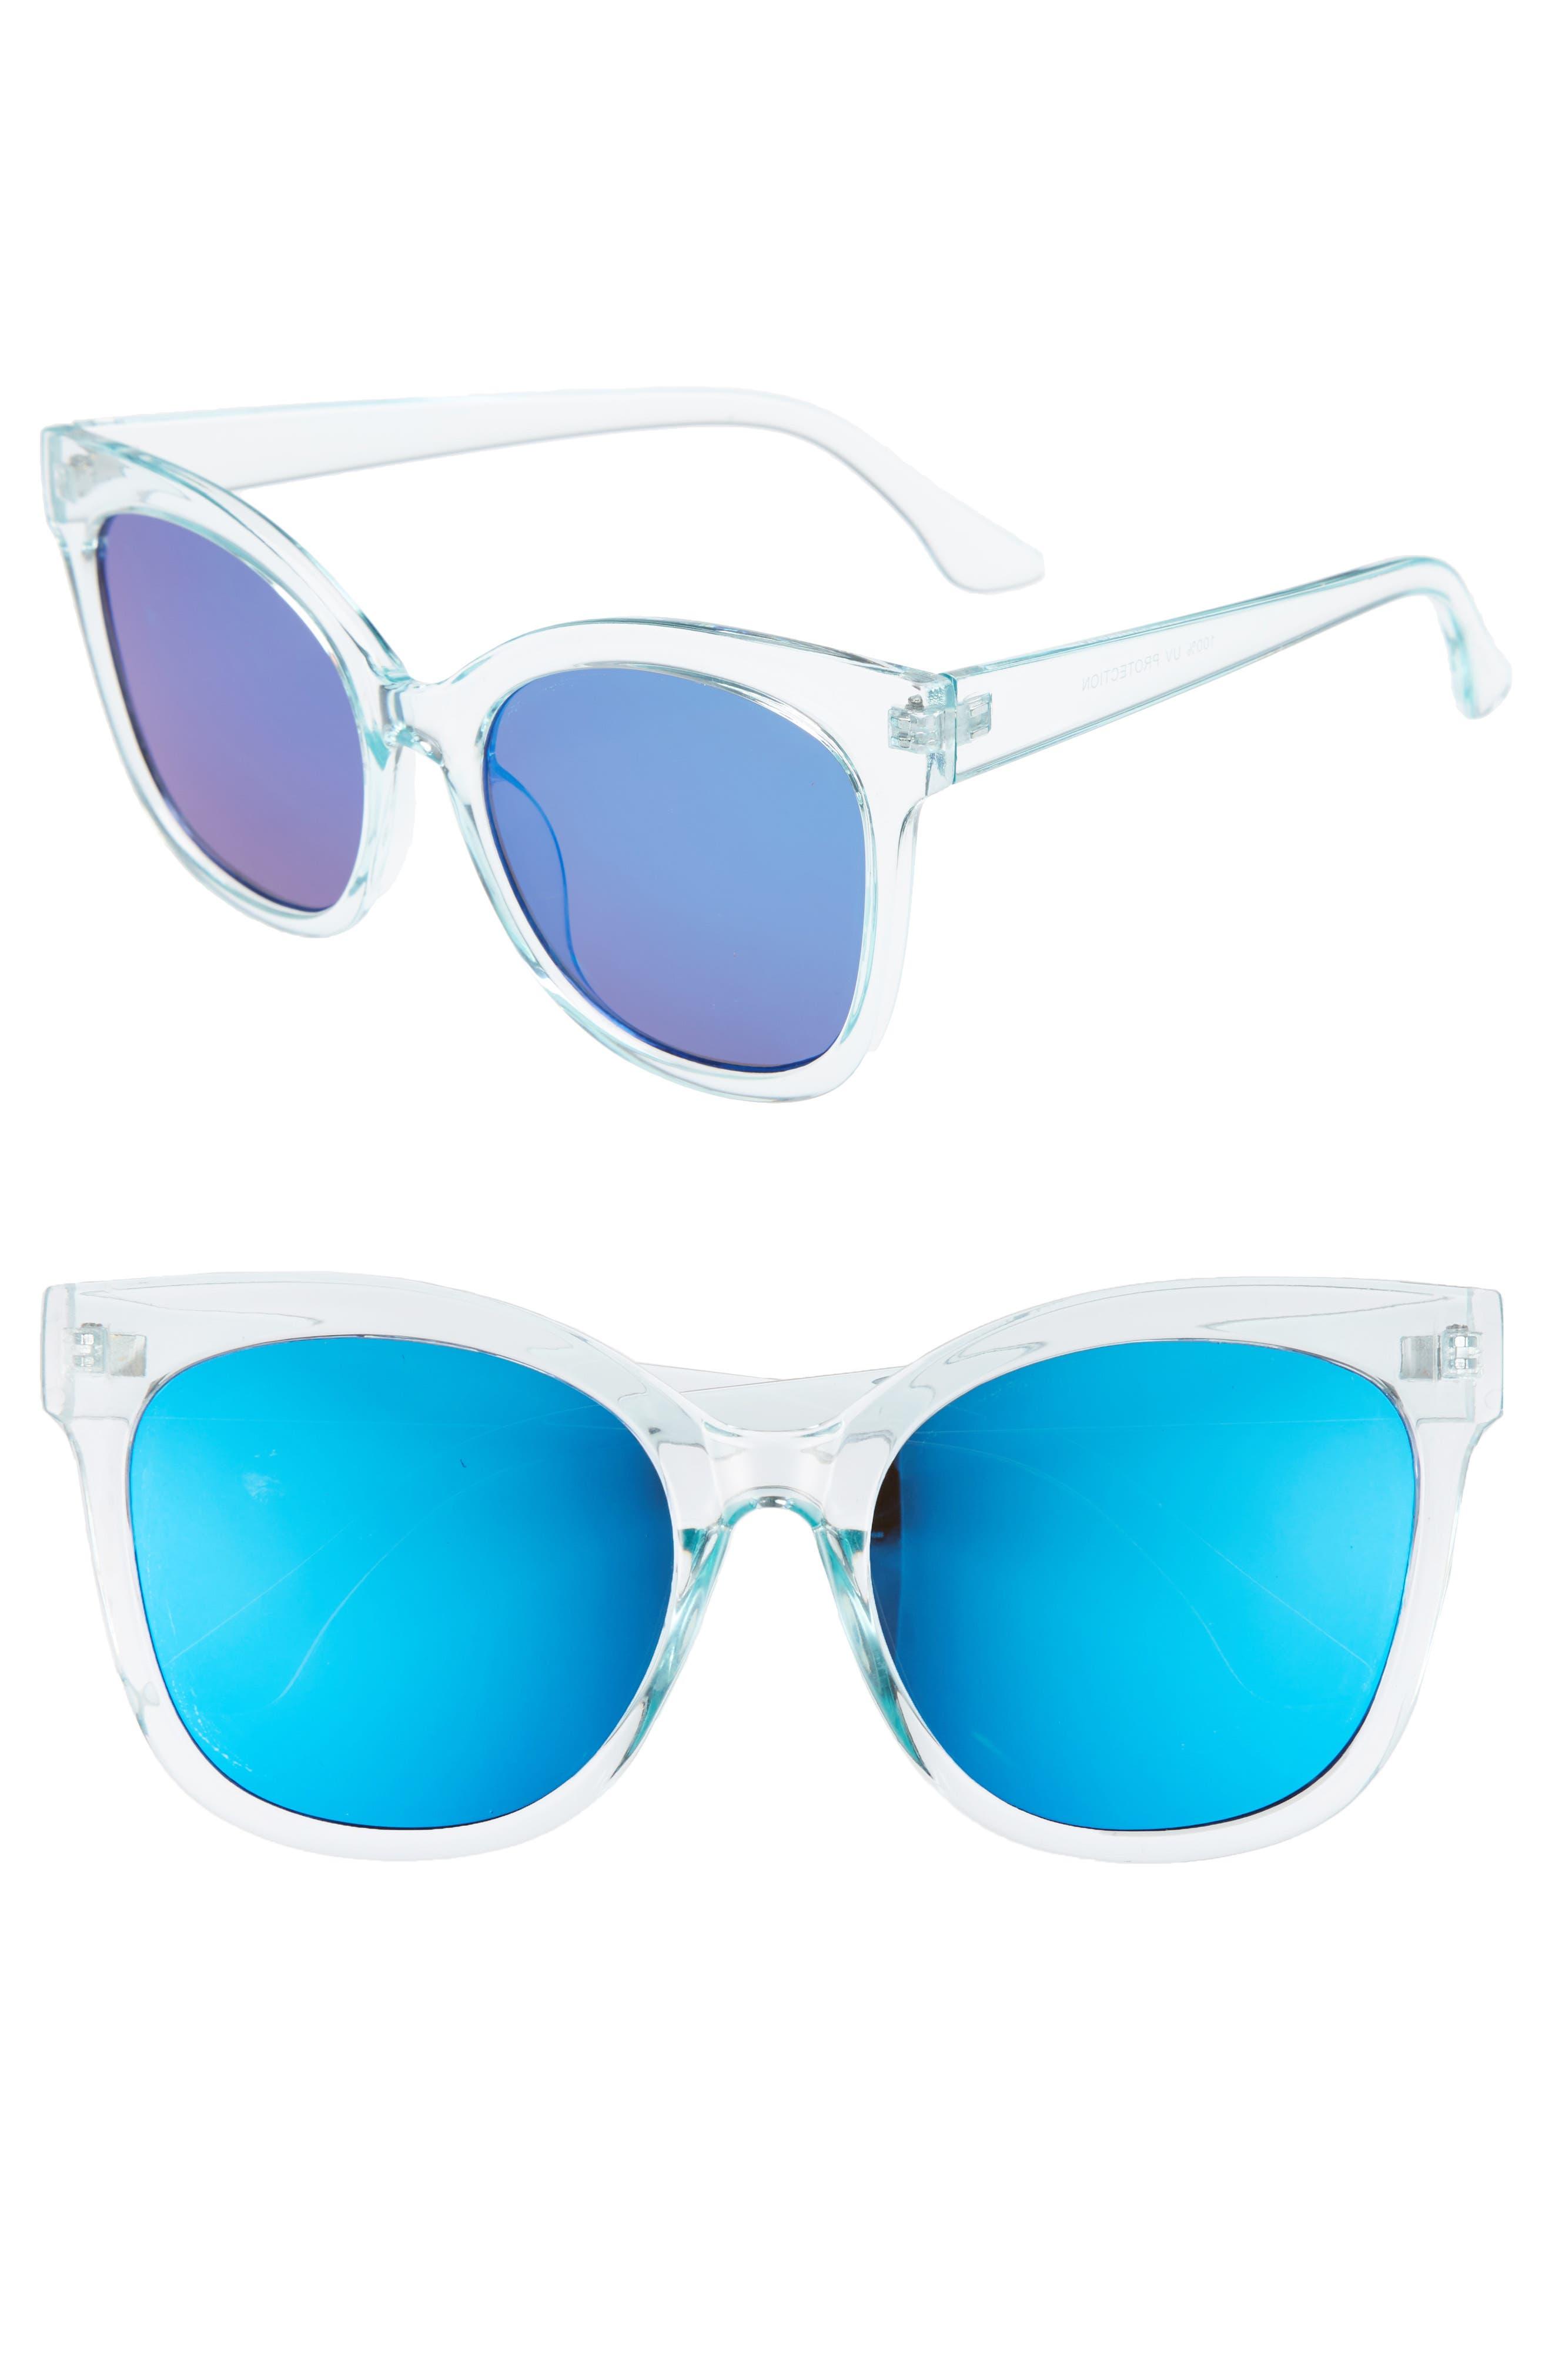 57mm Cat Eye Sunglasses,                             Main thumbnail 1, color,                             300